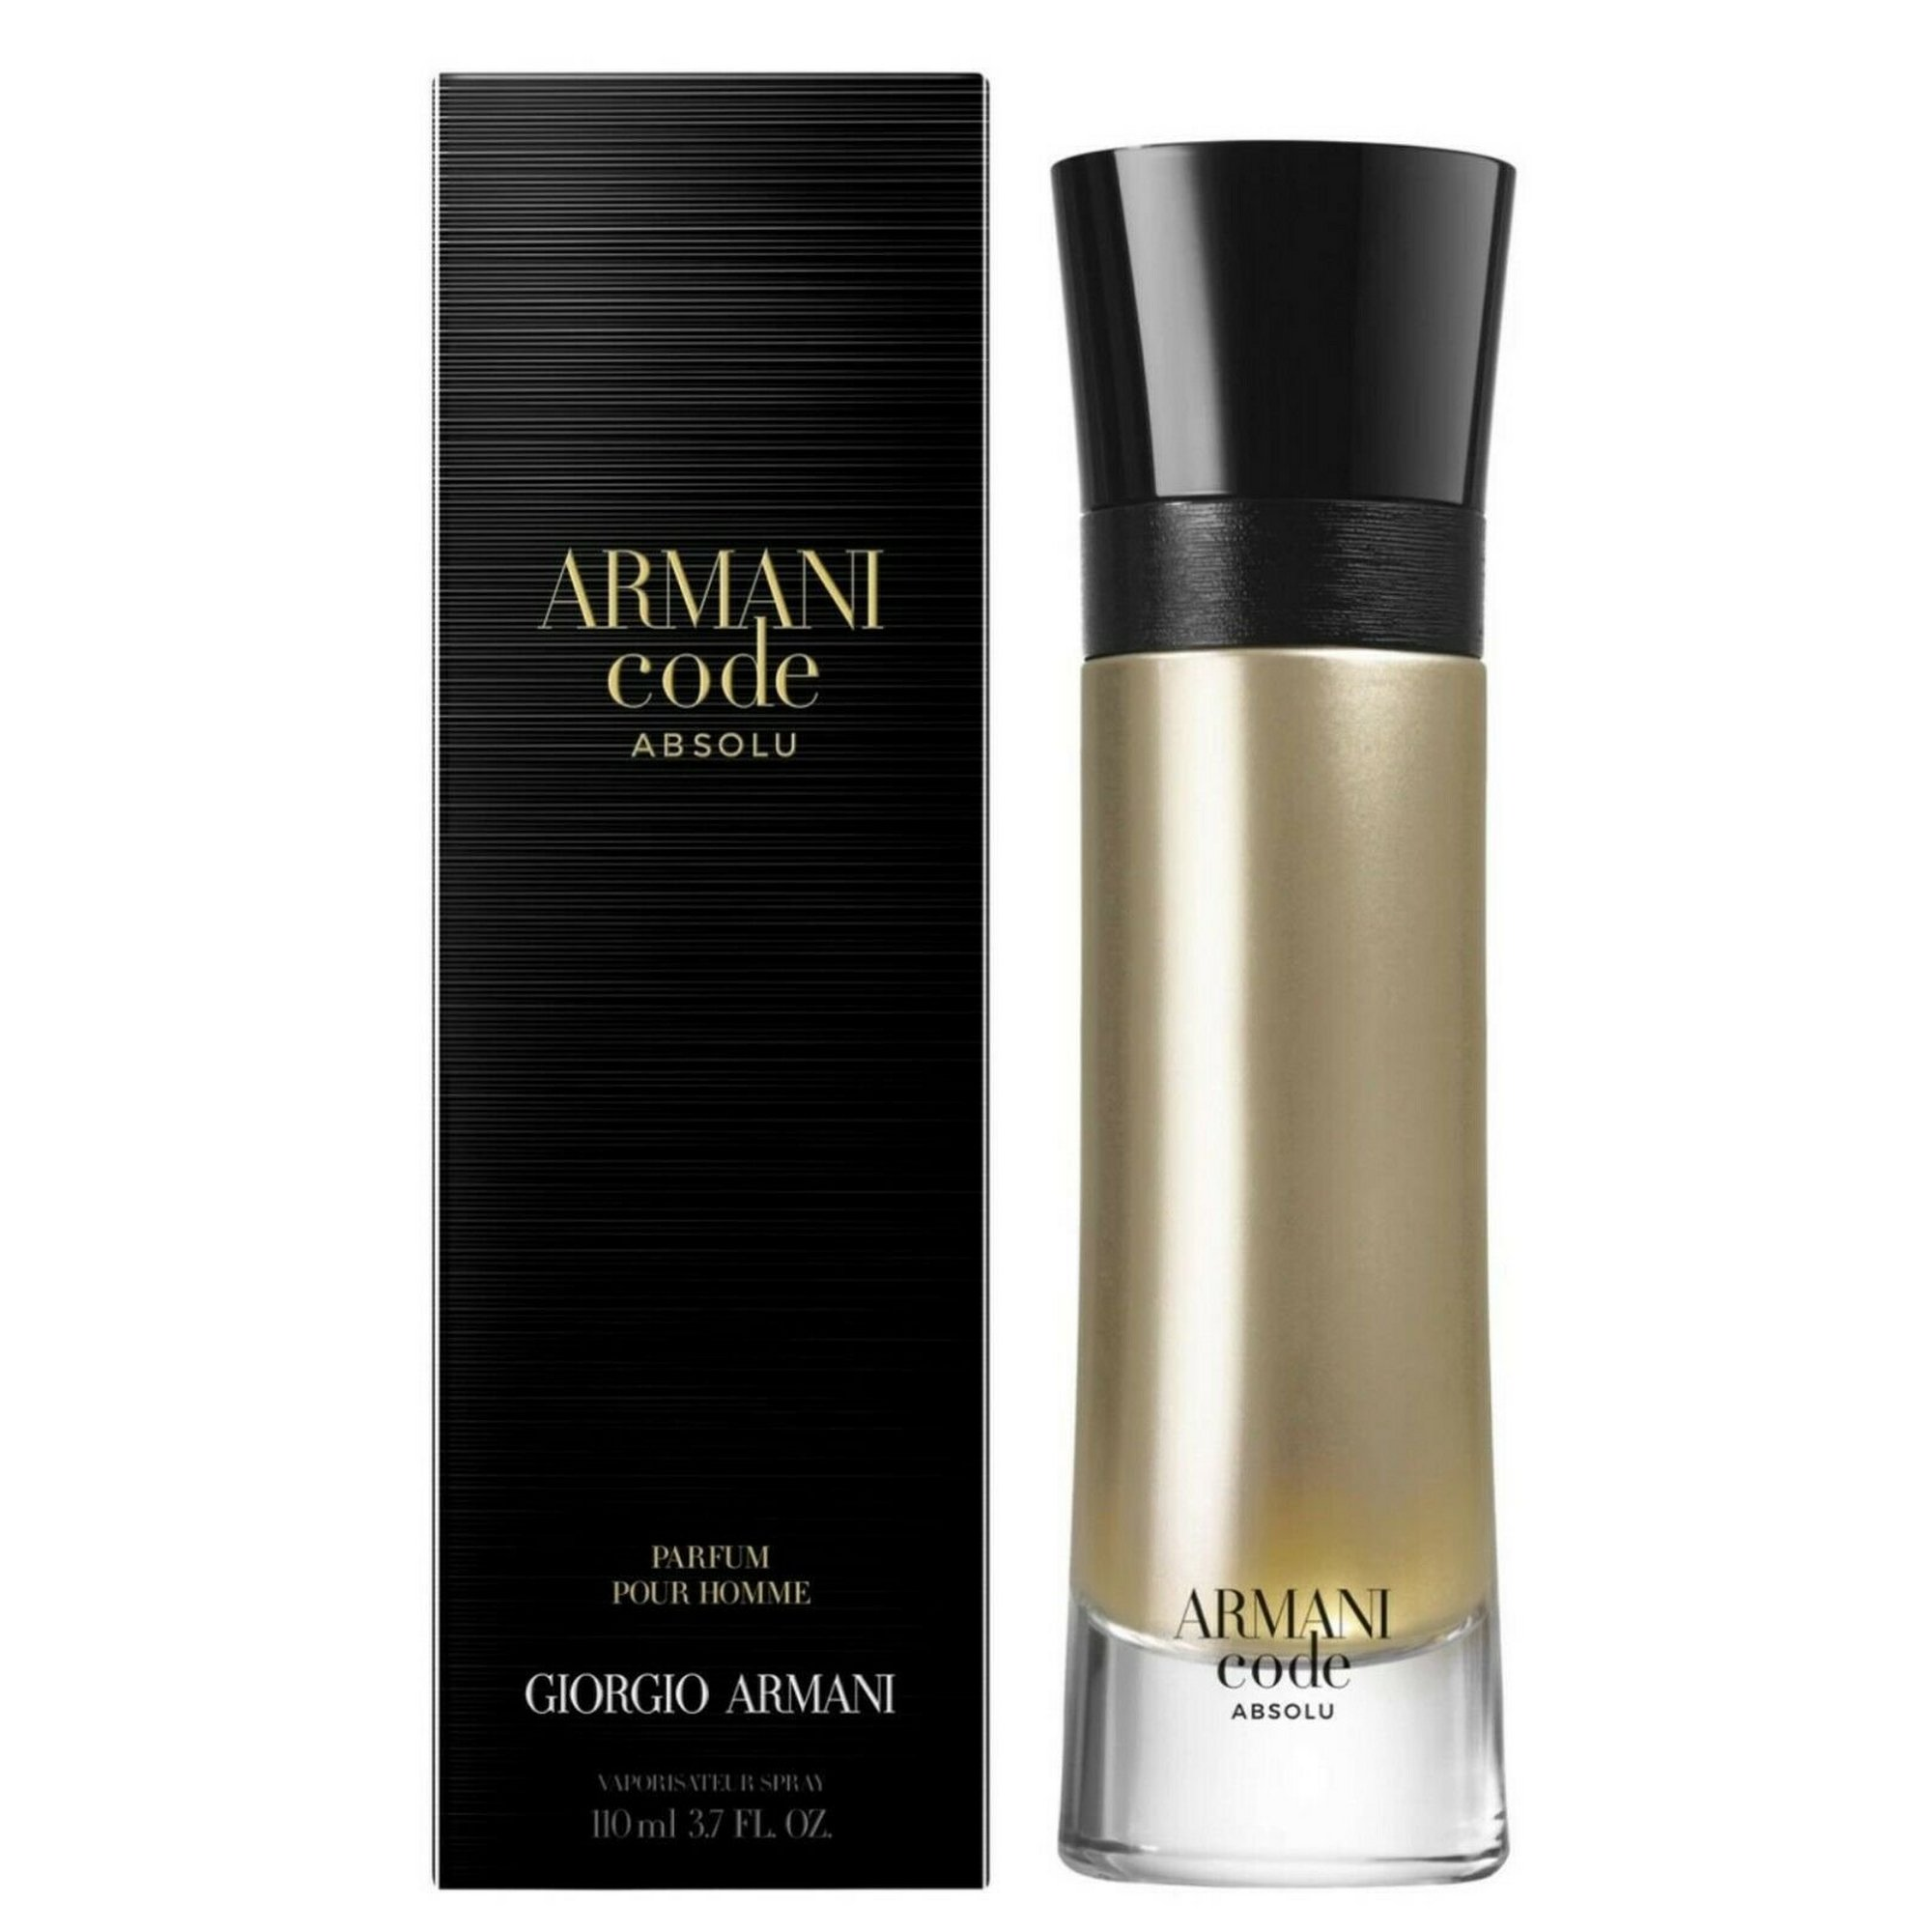 Image of Giorgio Armani Code Absolu 60ml Eau De Parfum